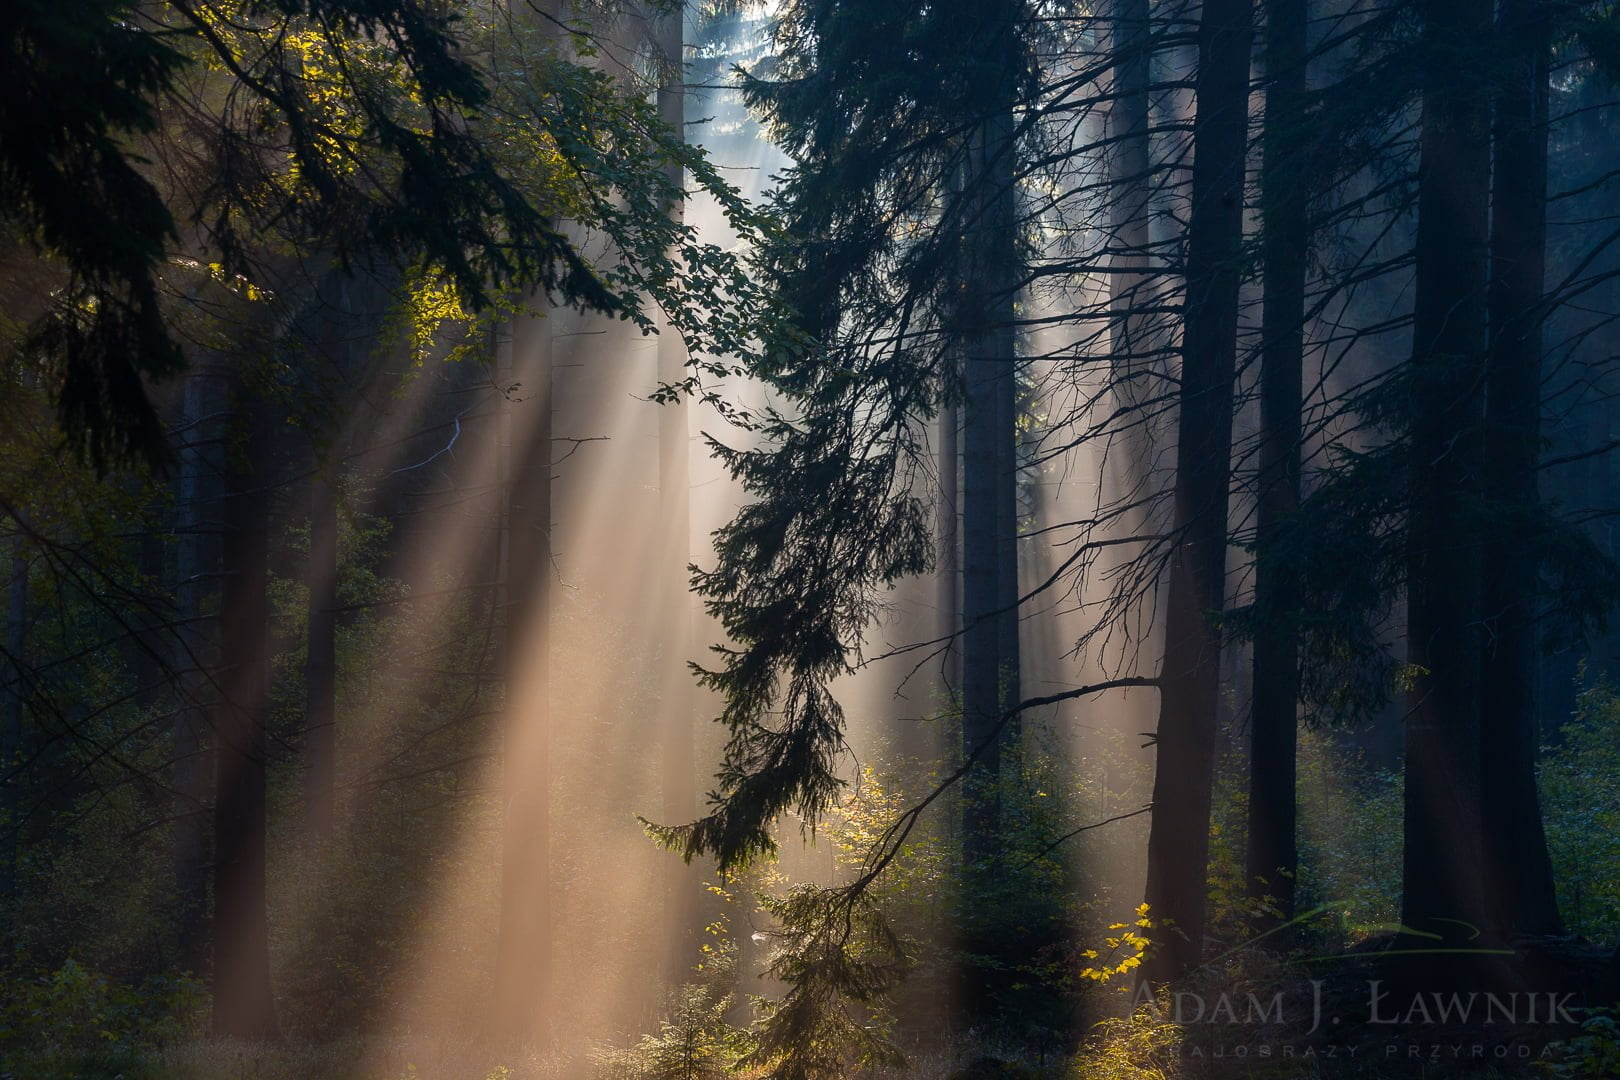 Stołowe Mountains National Park, Poland 1110-02212C